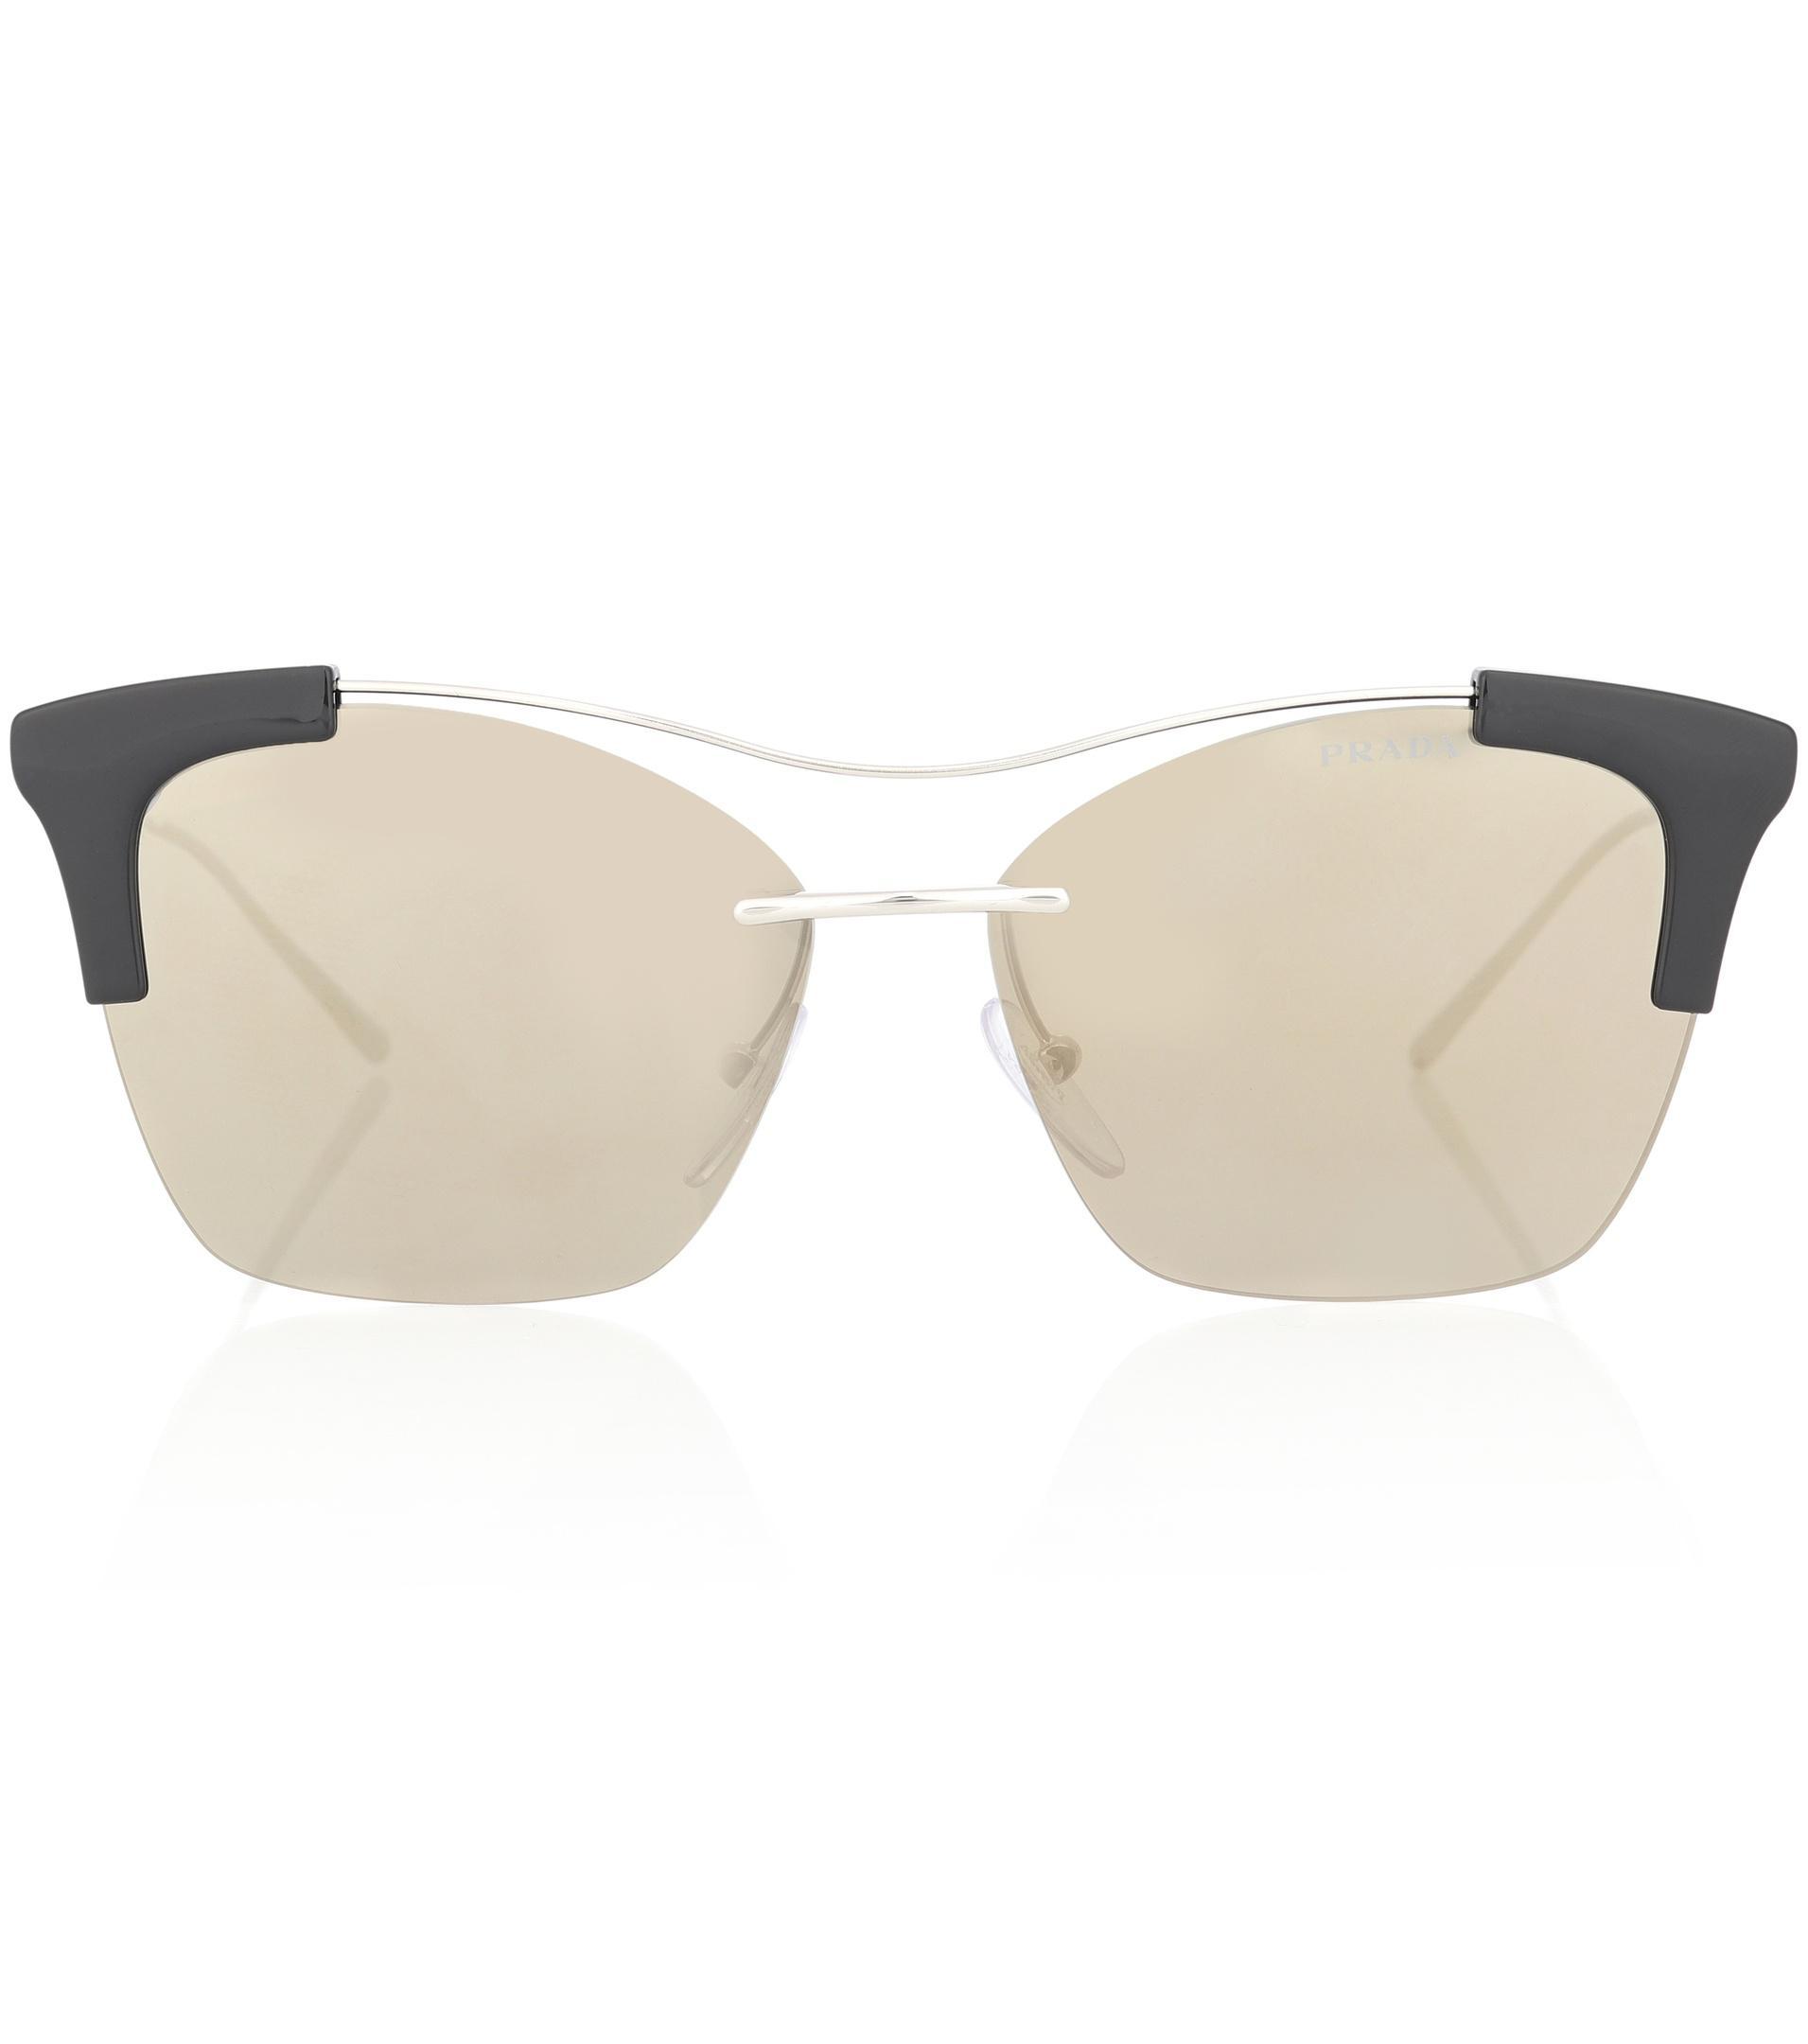 7733cedf527f9 Lyst - Prada Cat-eye Sunglasses in Metallic